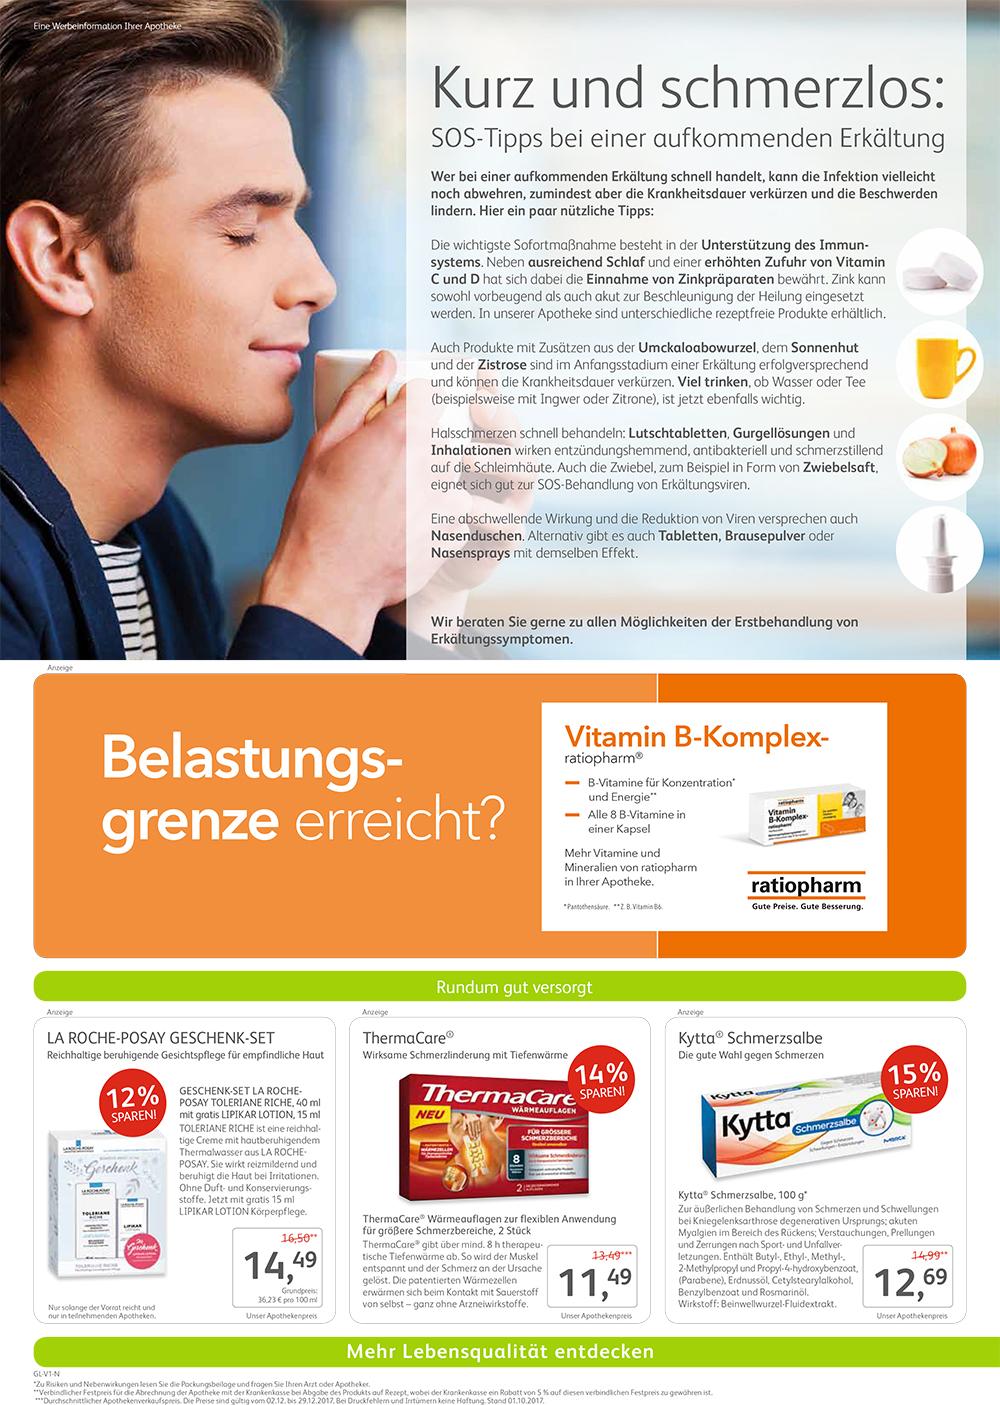 http://www.apotheken.de/fileadmin/clubarea/00000-Angebote/67459_neue_angebot_2.jpg